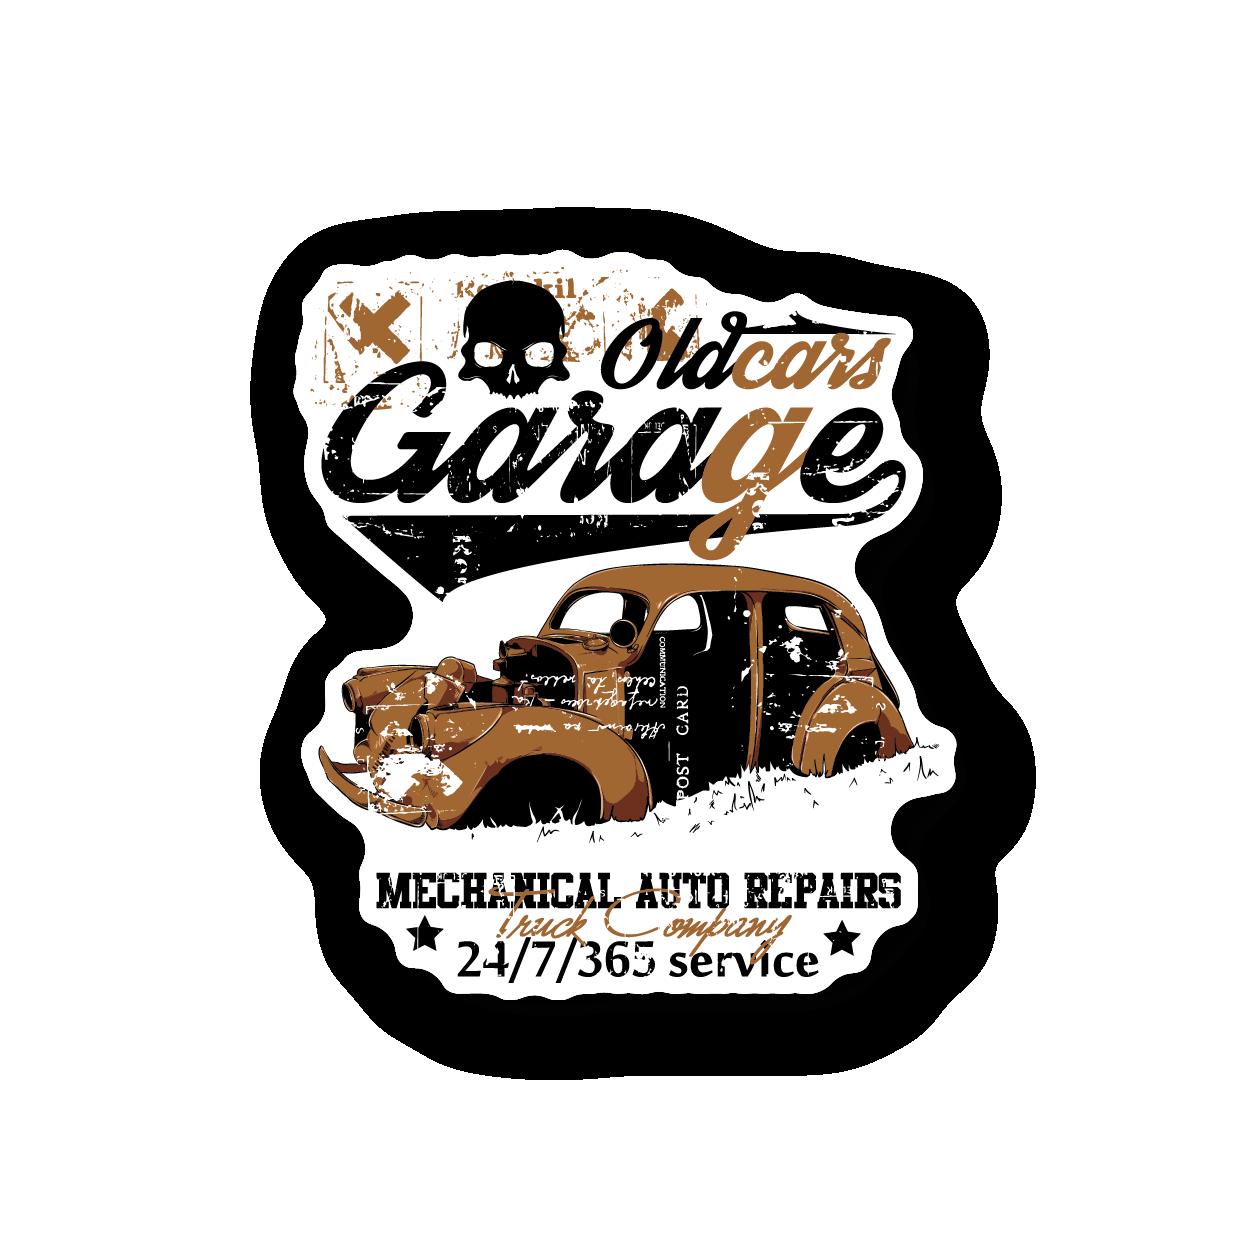 Tsd Cold Car Garage Vinyl Stickers Gloss Stickers Fun Stickers Car Stickers Car Garage [ 1250 x 1250 Pixel ]